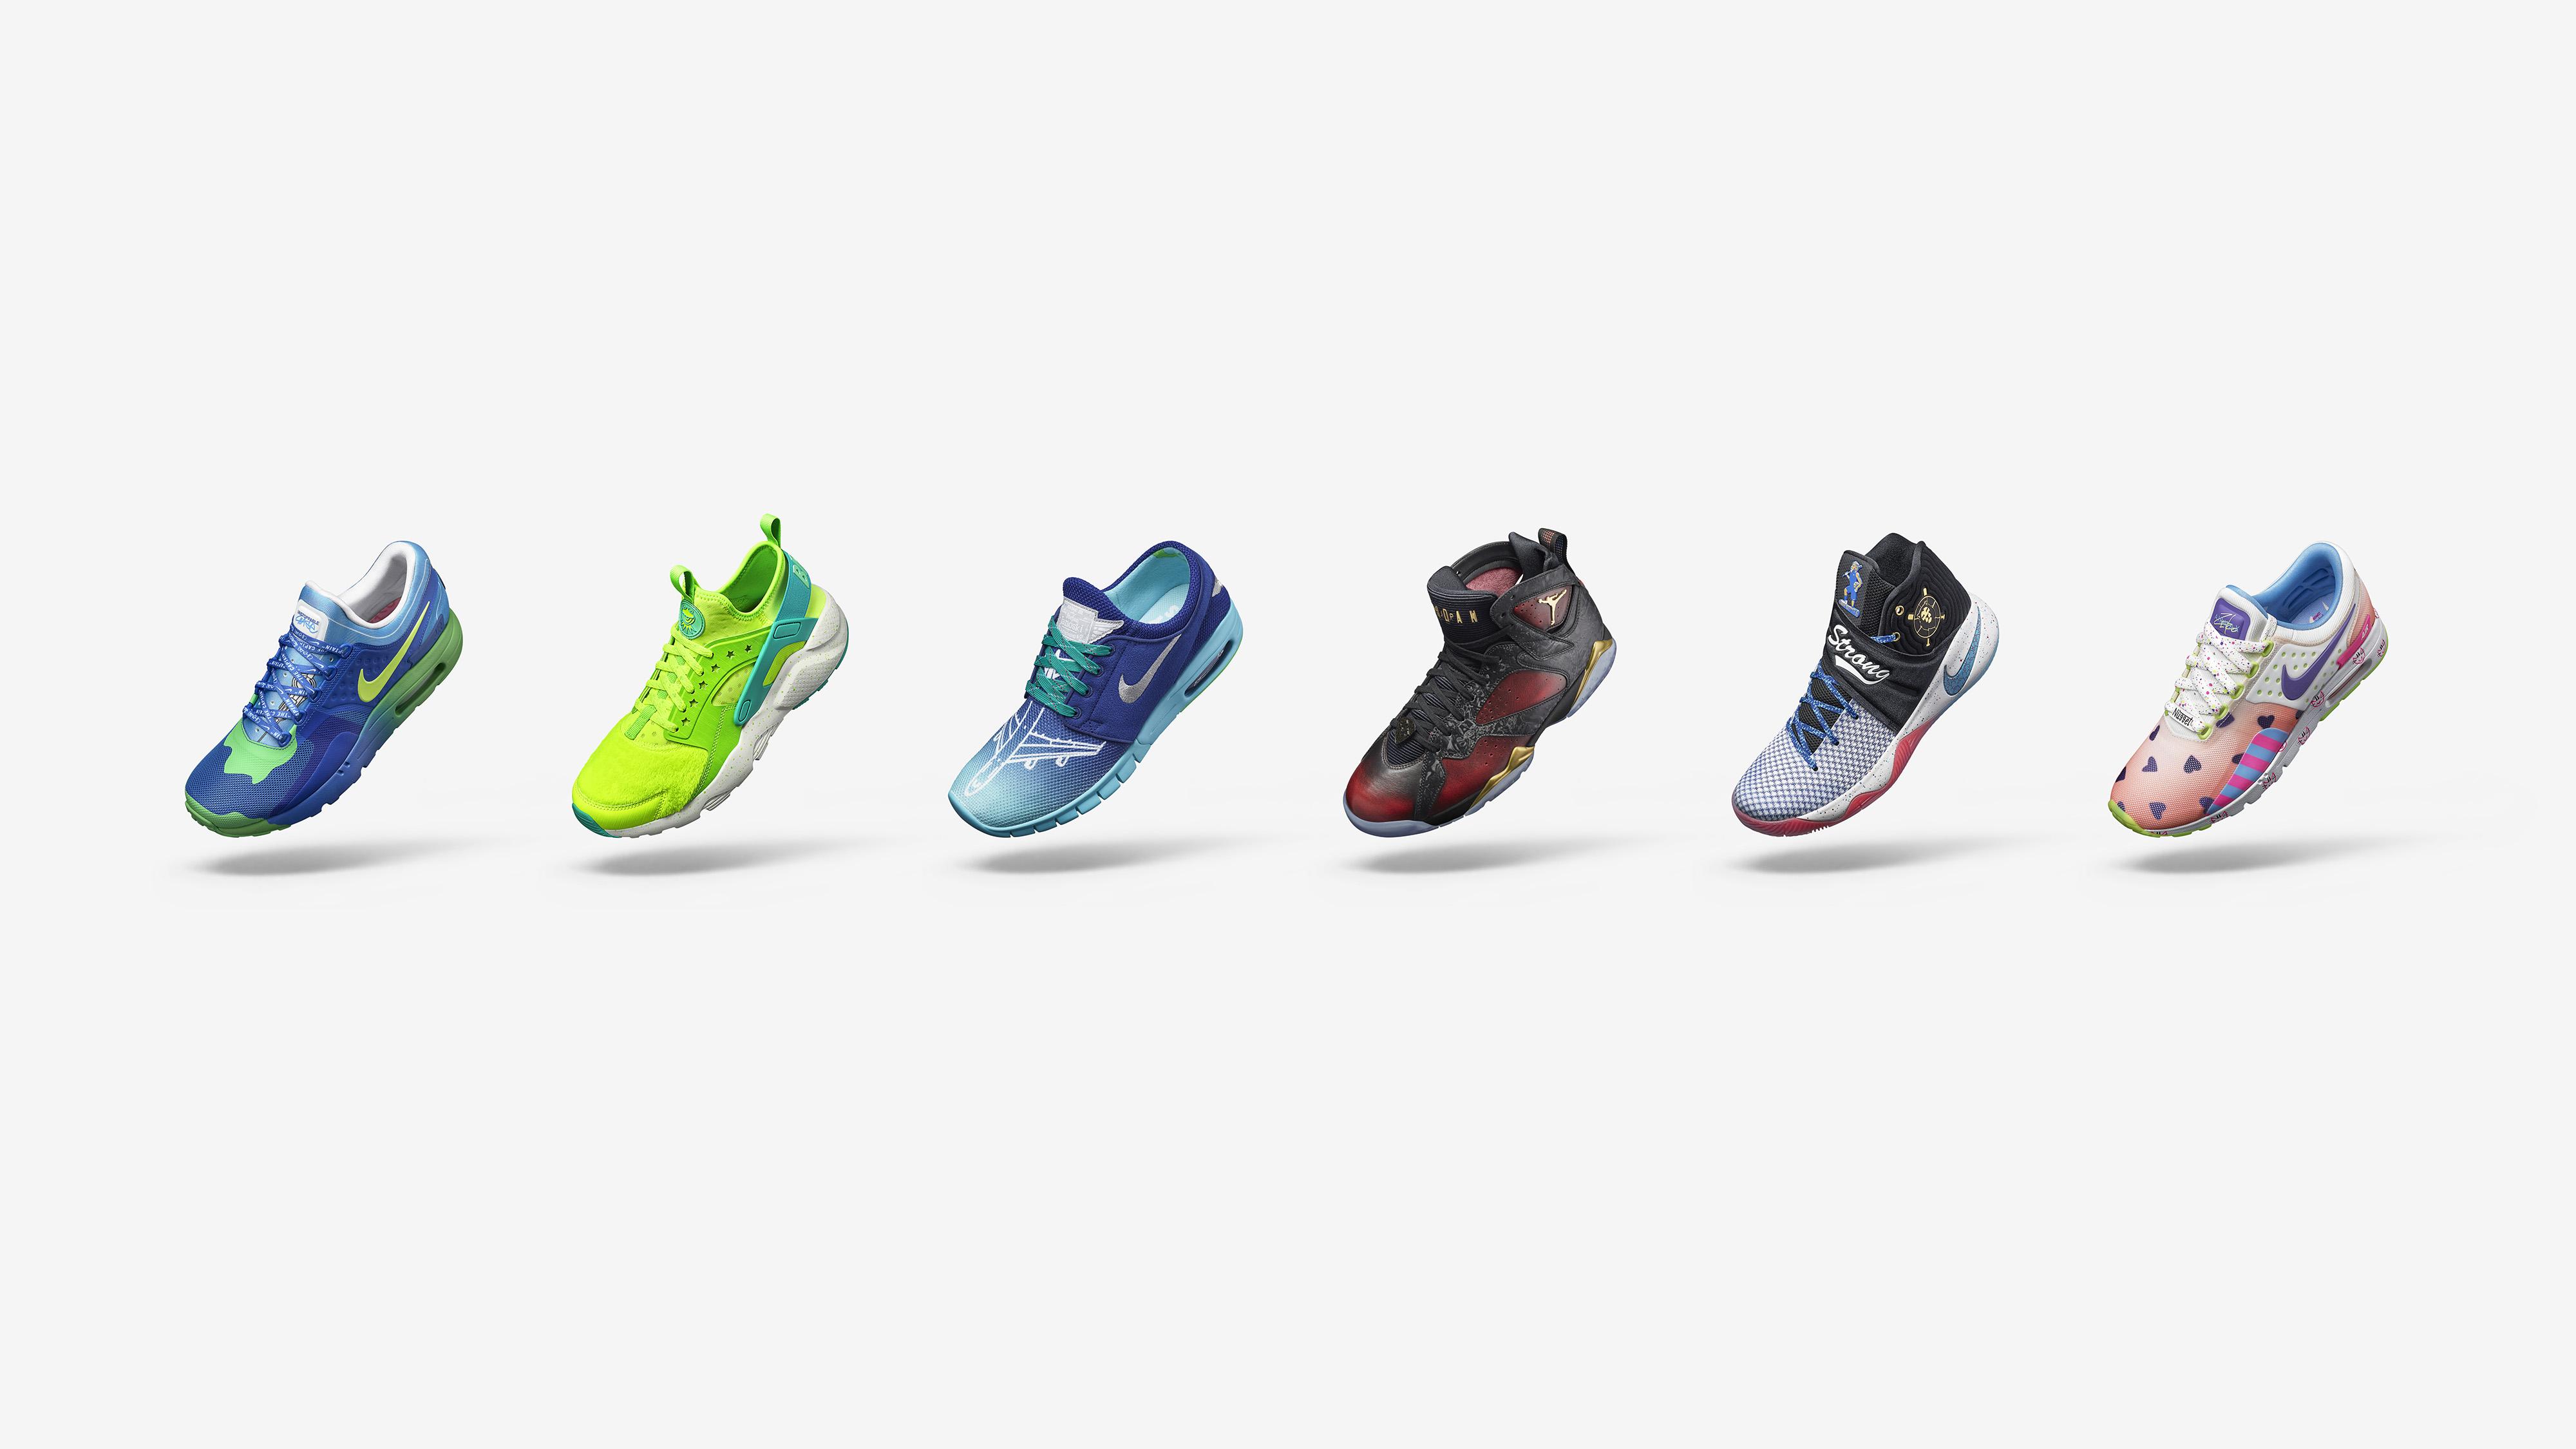 f0ae6805a83 38 Nike LeBron 13 Doernbecher Freestyle Collection  Introducing the 13th Doernbecher  Freestyle Collection  Nike Doernbecher Freestyle 2014 ...